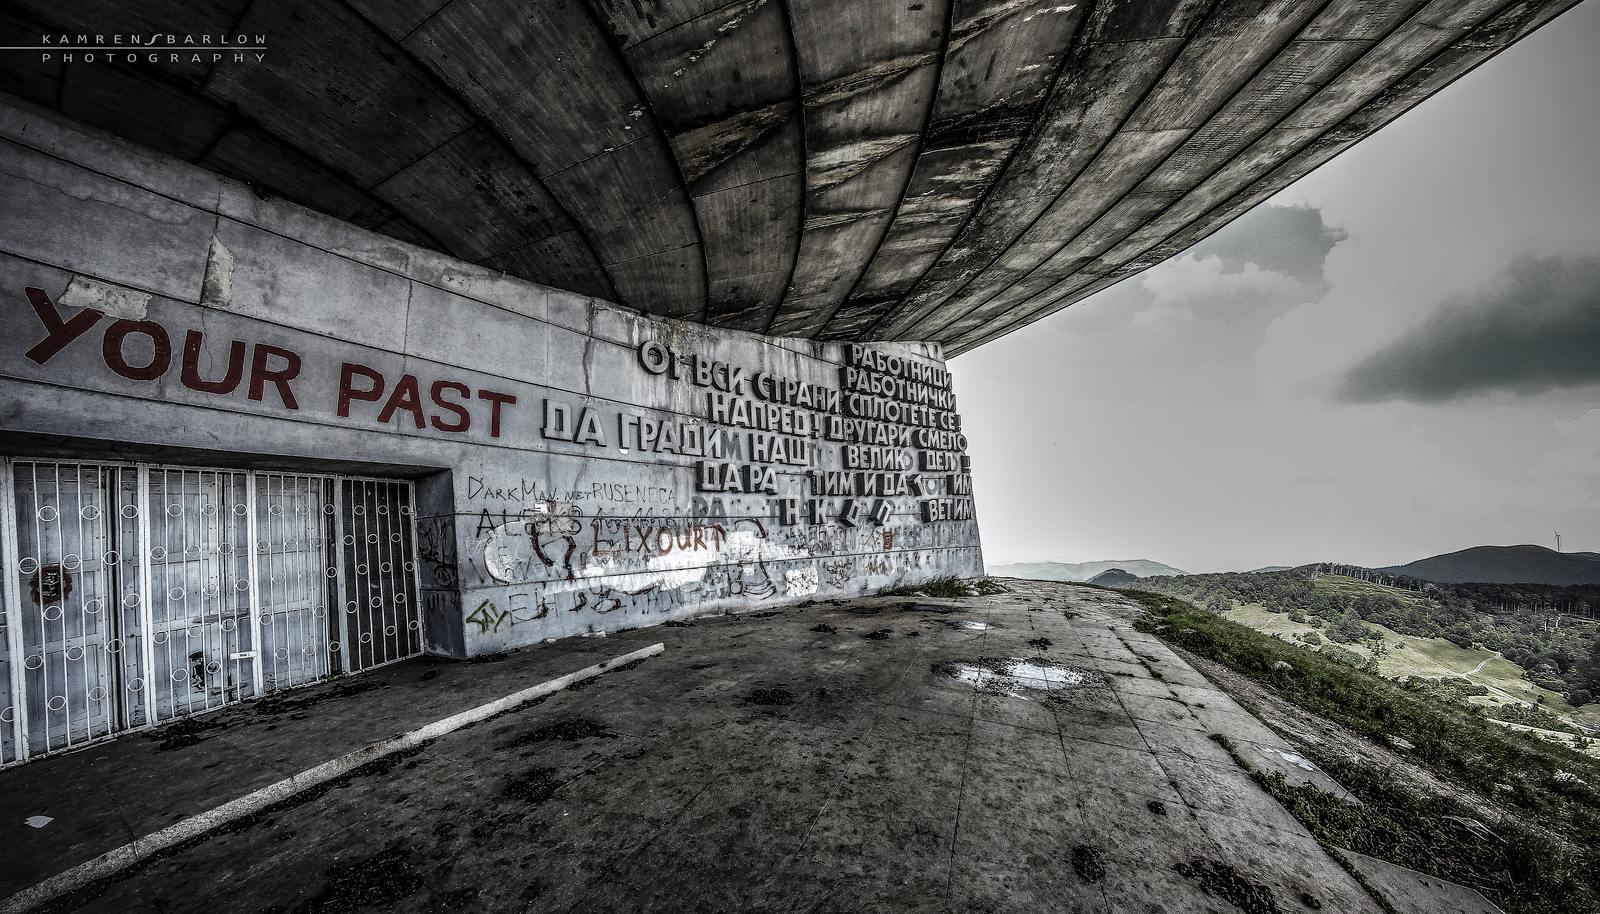 buzludzha7 Buzludzha   Forgotten Communist Monument